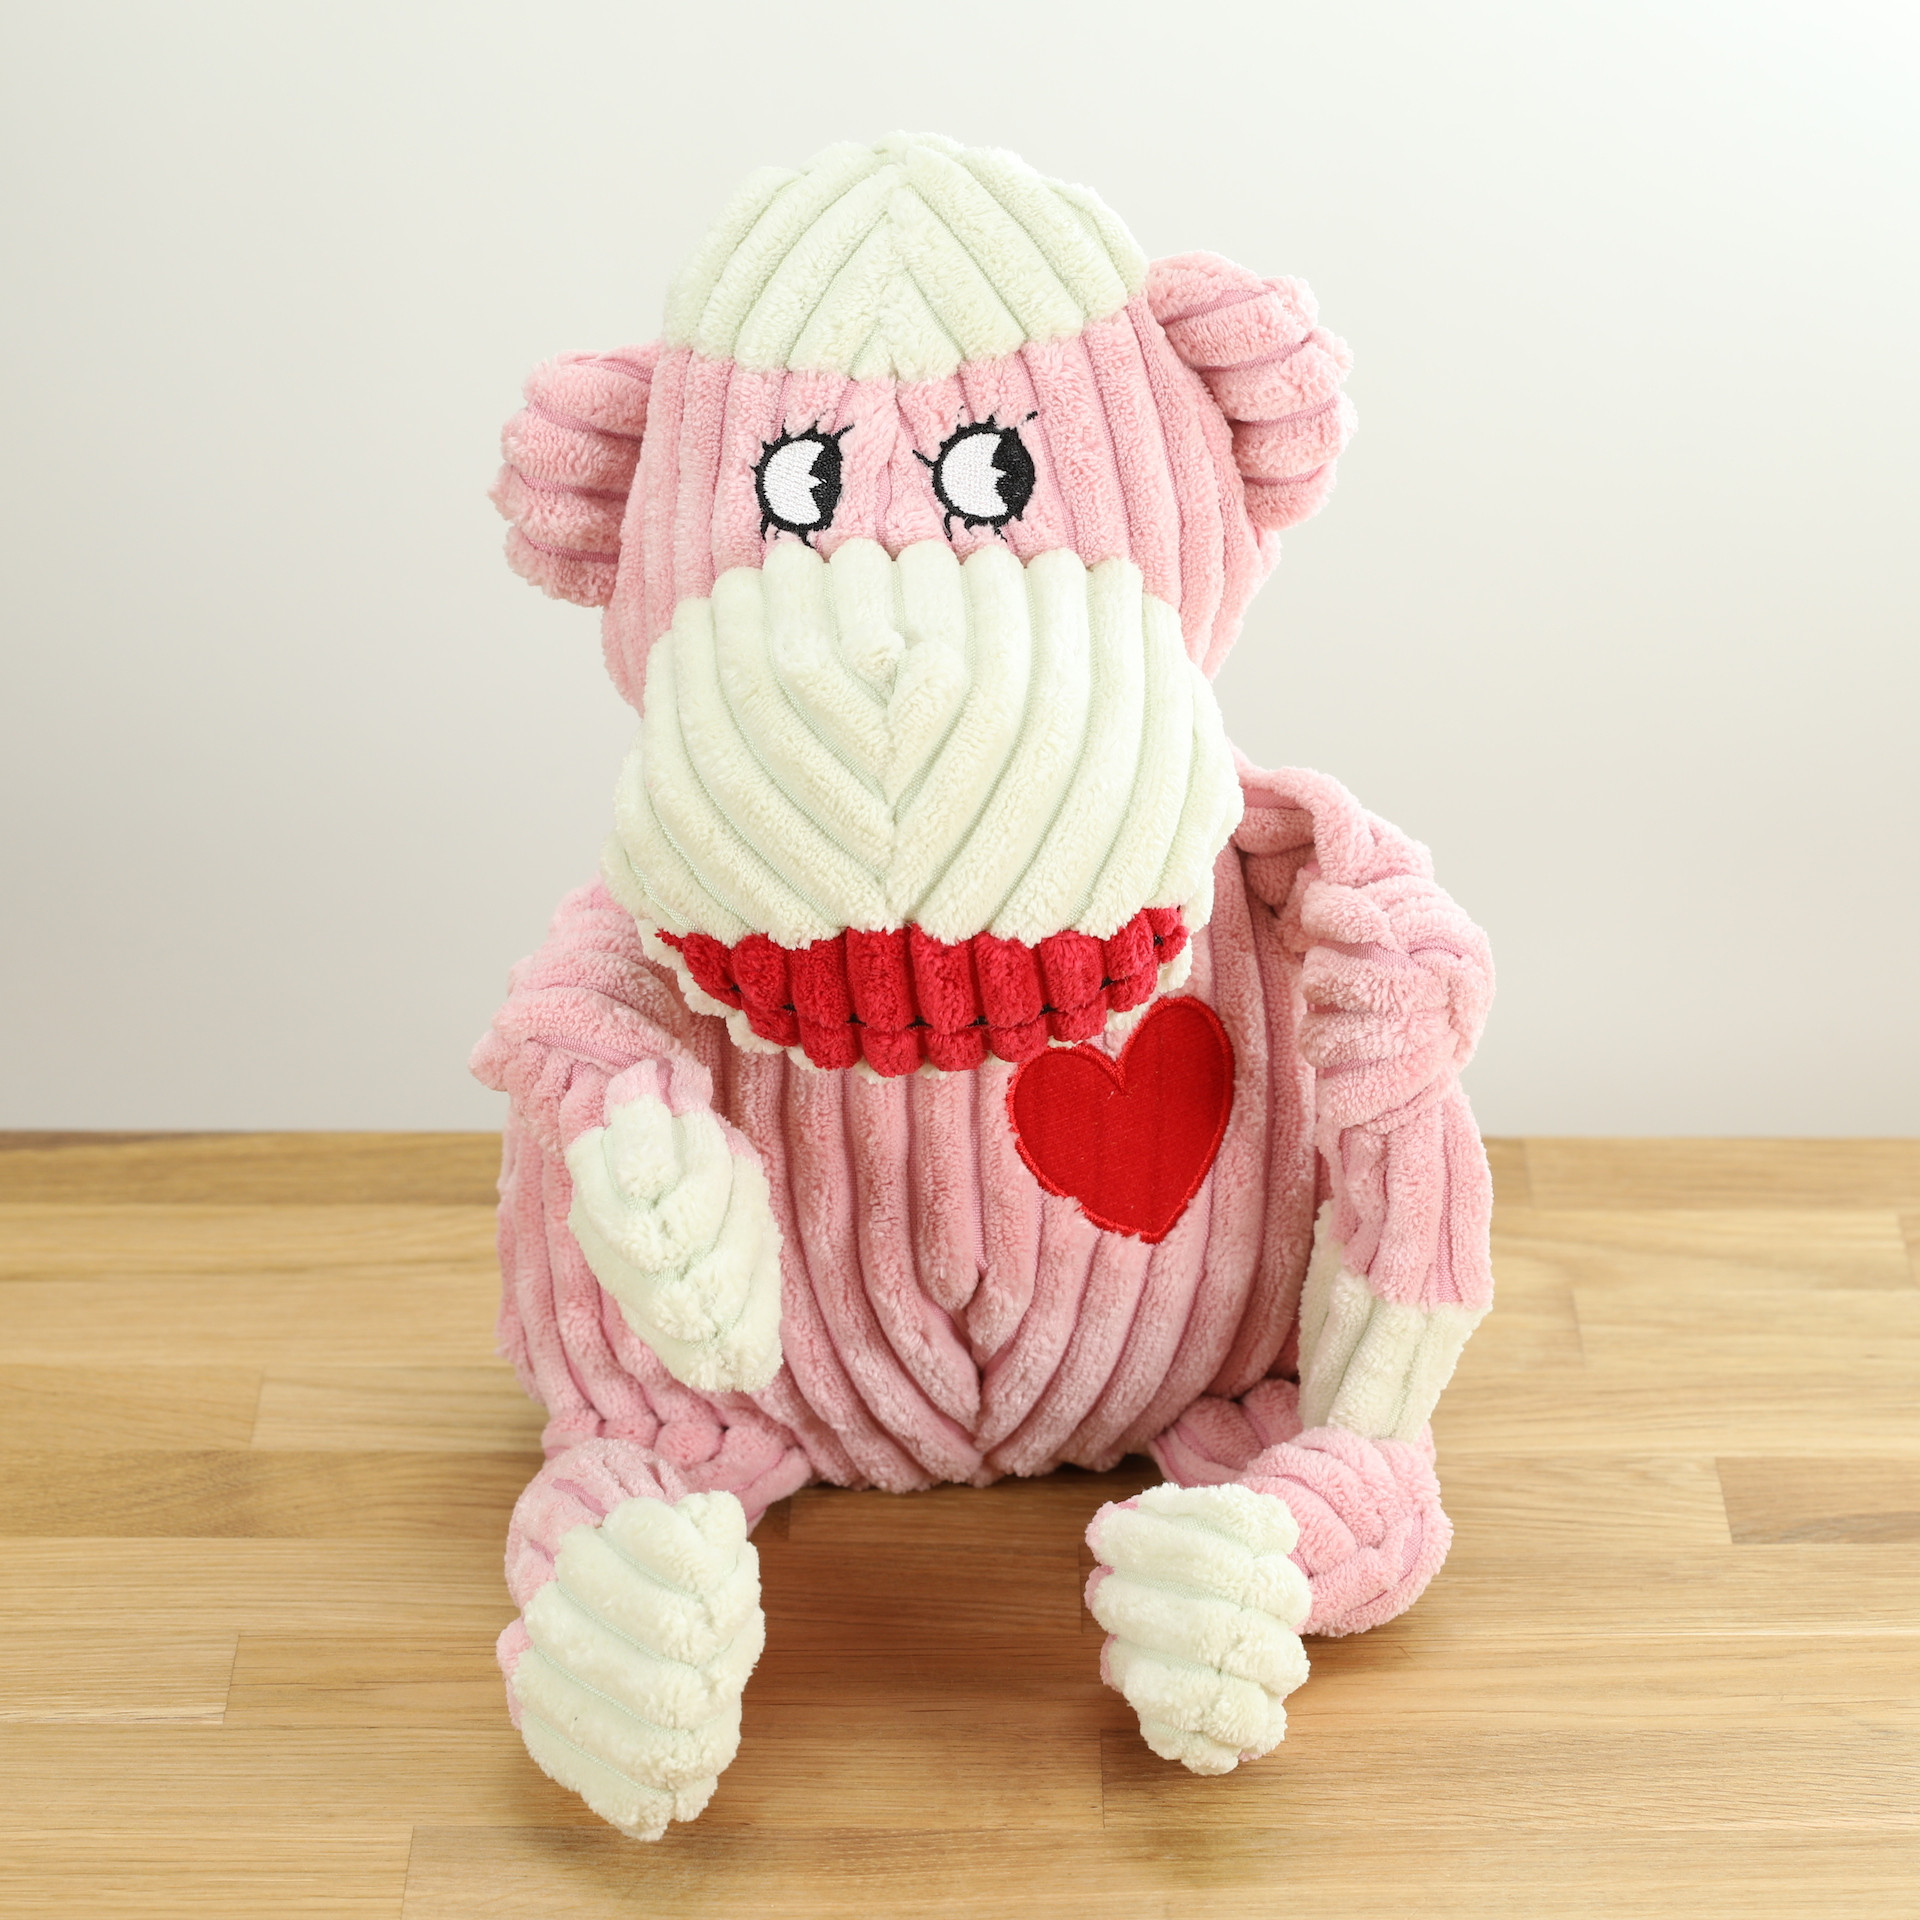 Hundespielzeug Fräulein Sock, der rosa Affe